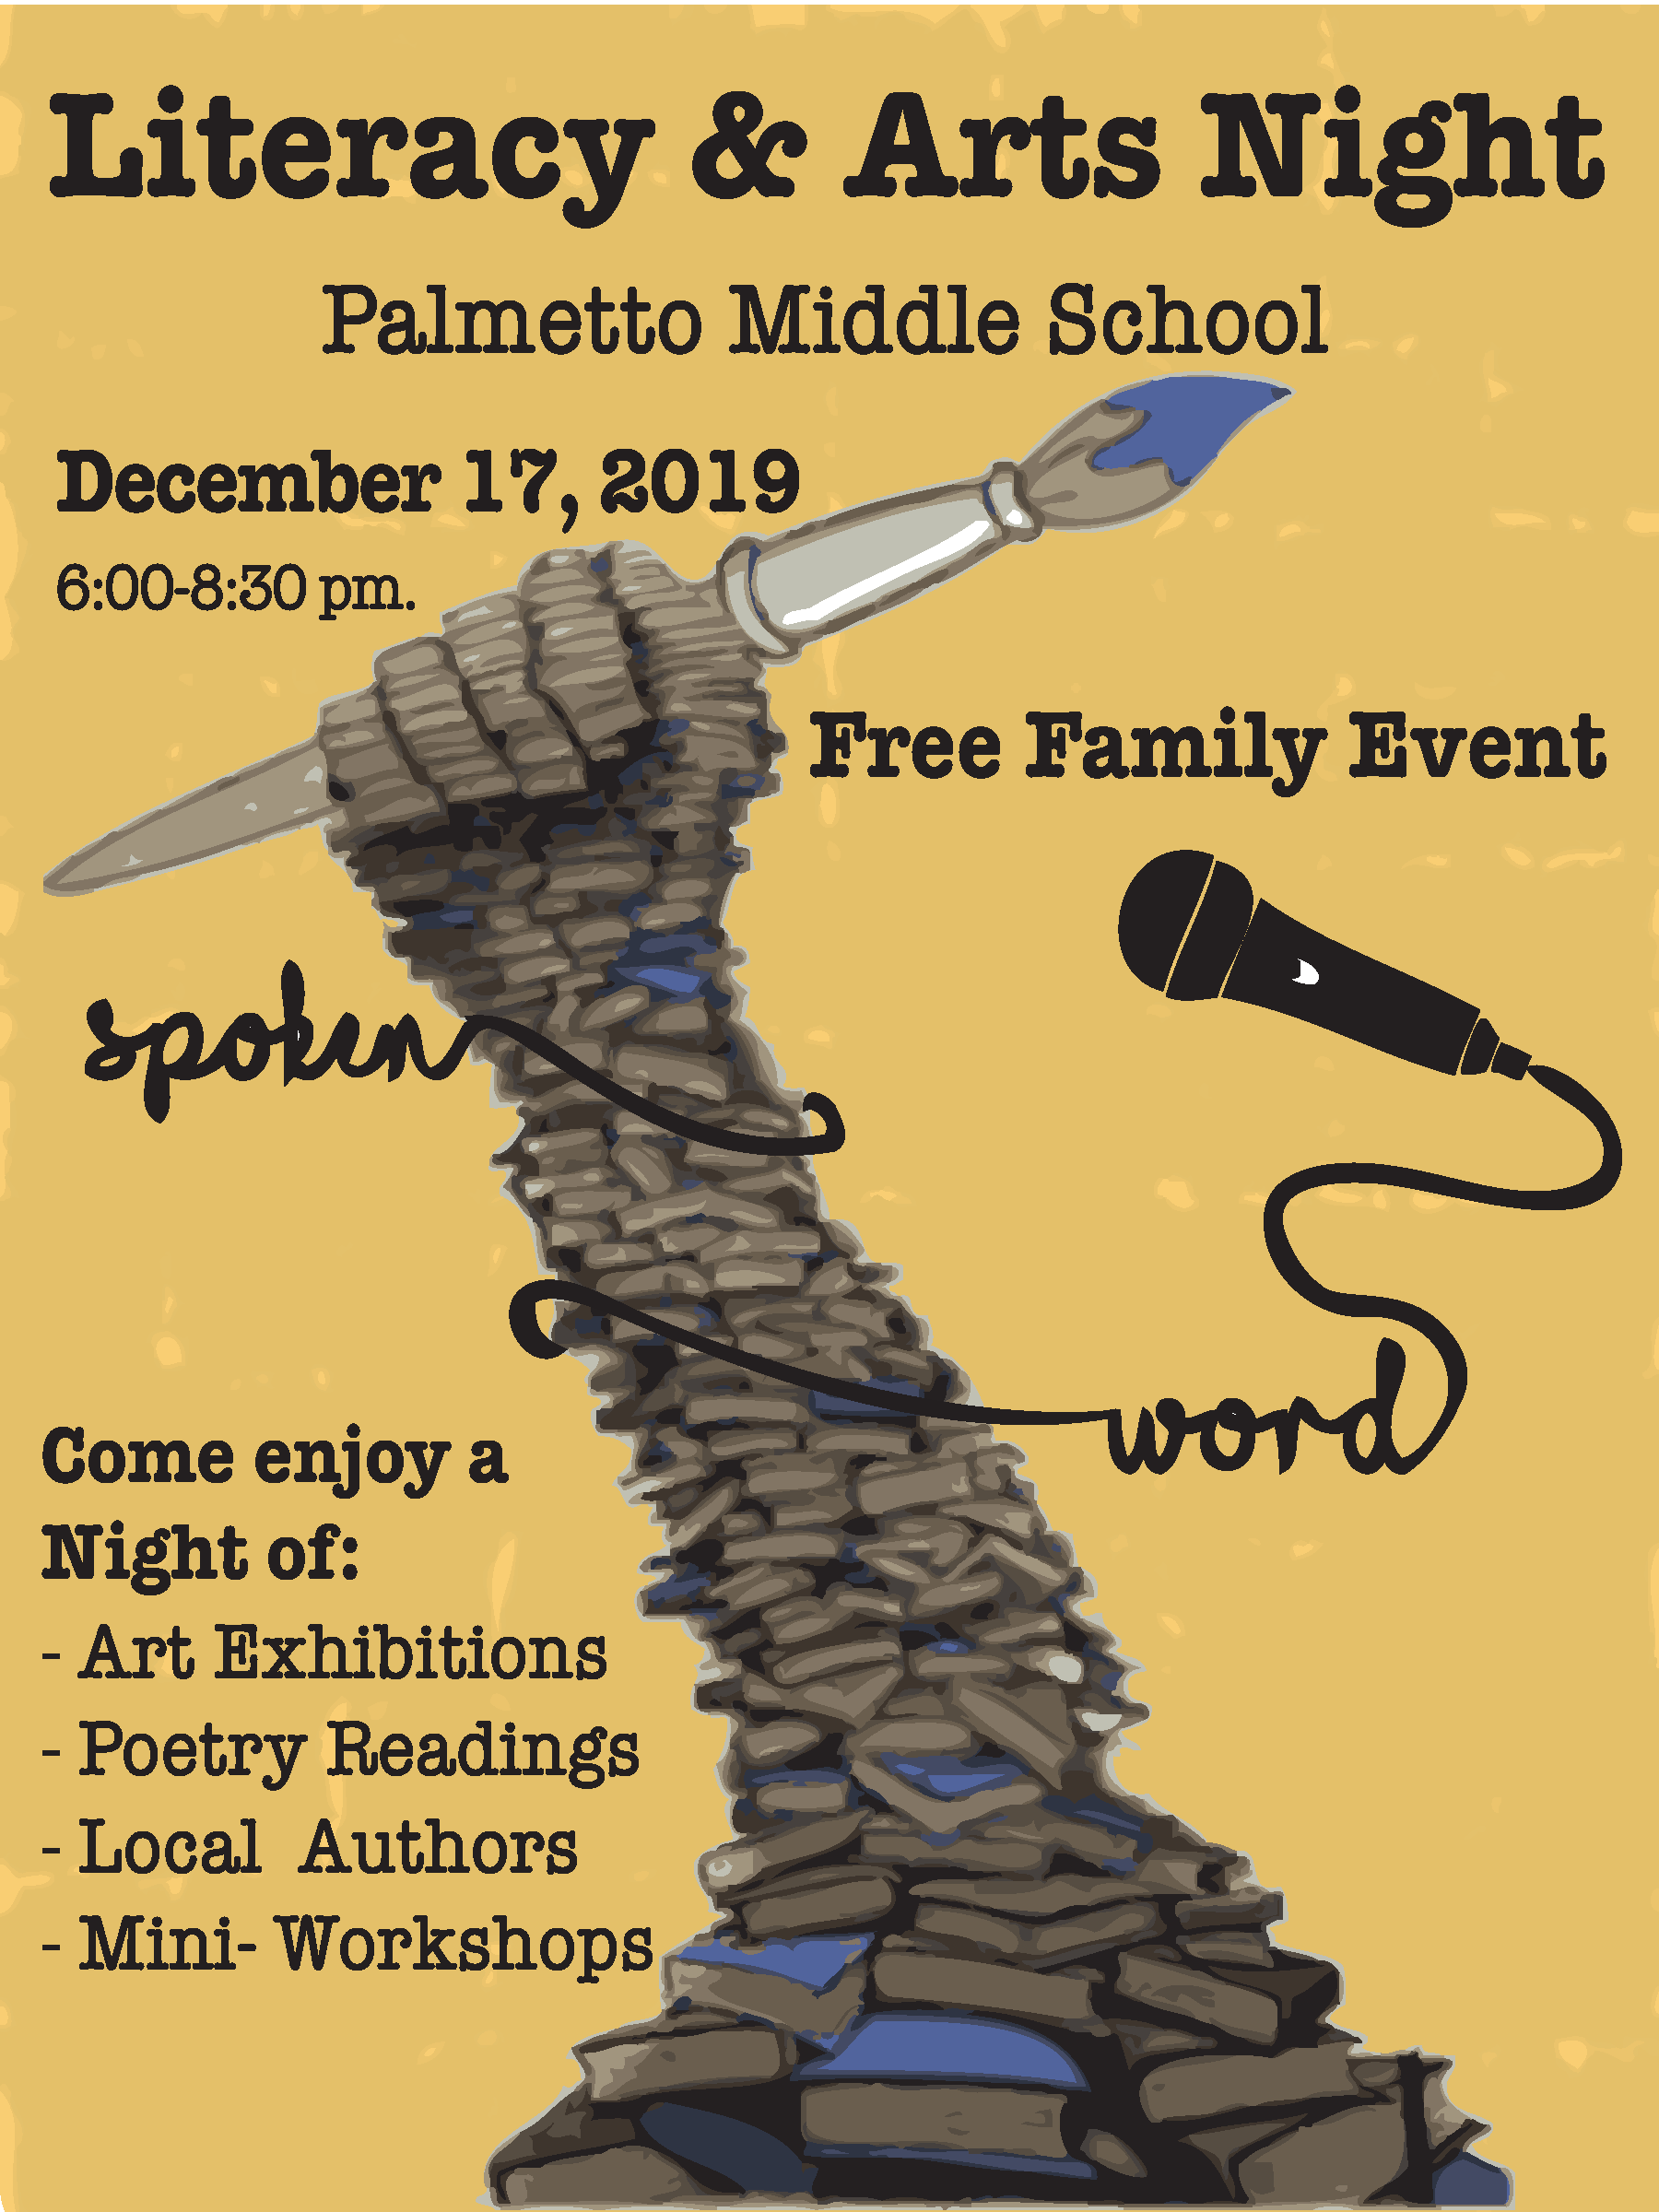 Literacy & Arts Night @ Palmetto Middle School